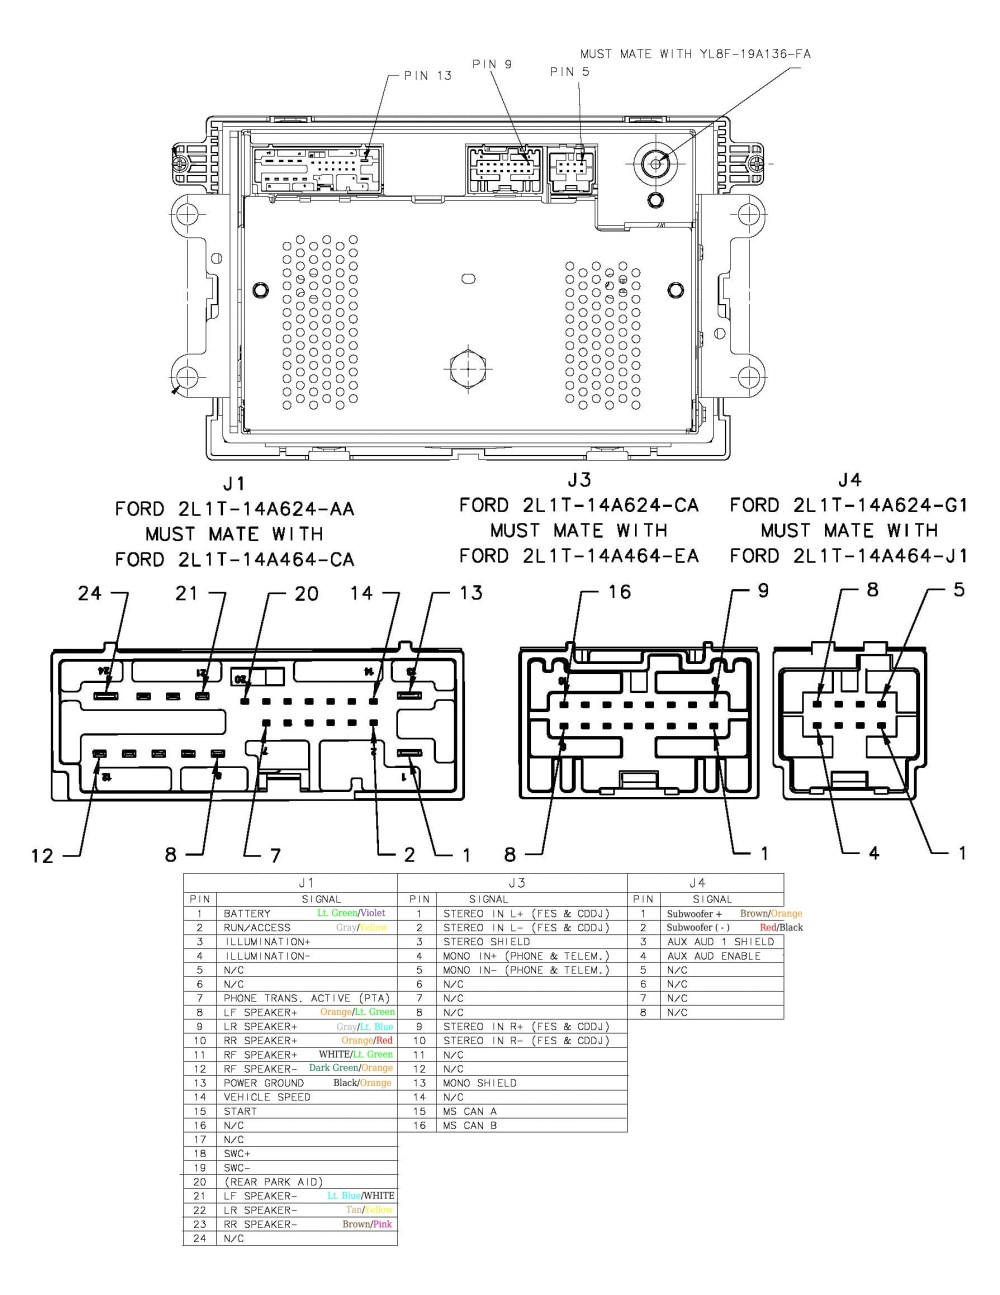 medium resolution of 1999 ford mustang radio wiring diagram free wiring diagram 99 ford f150 wiring diagram 99 ford mustang wiring diagram